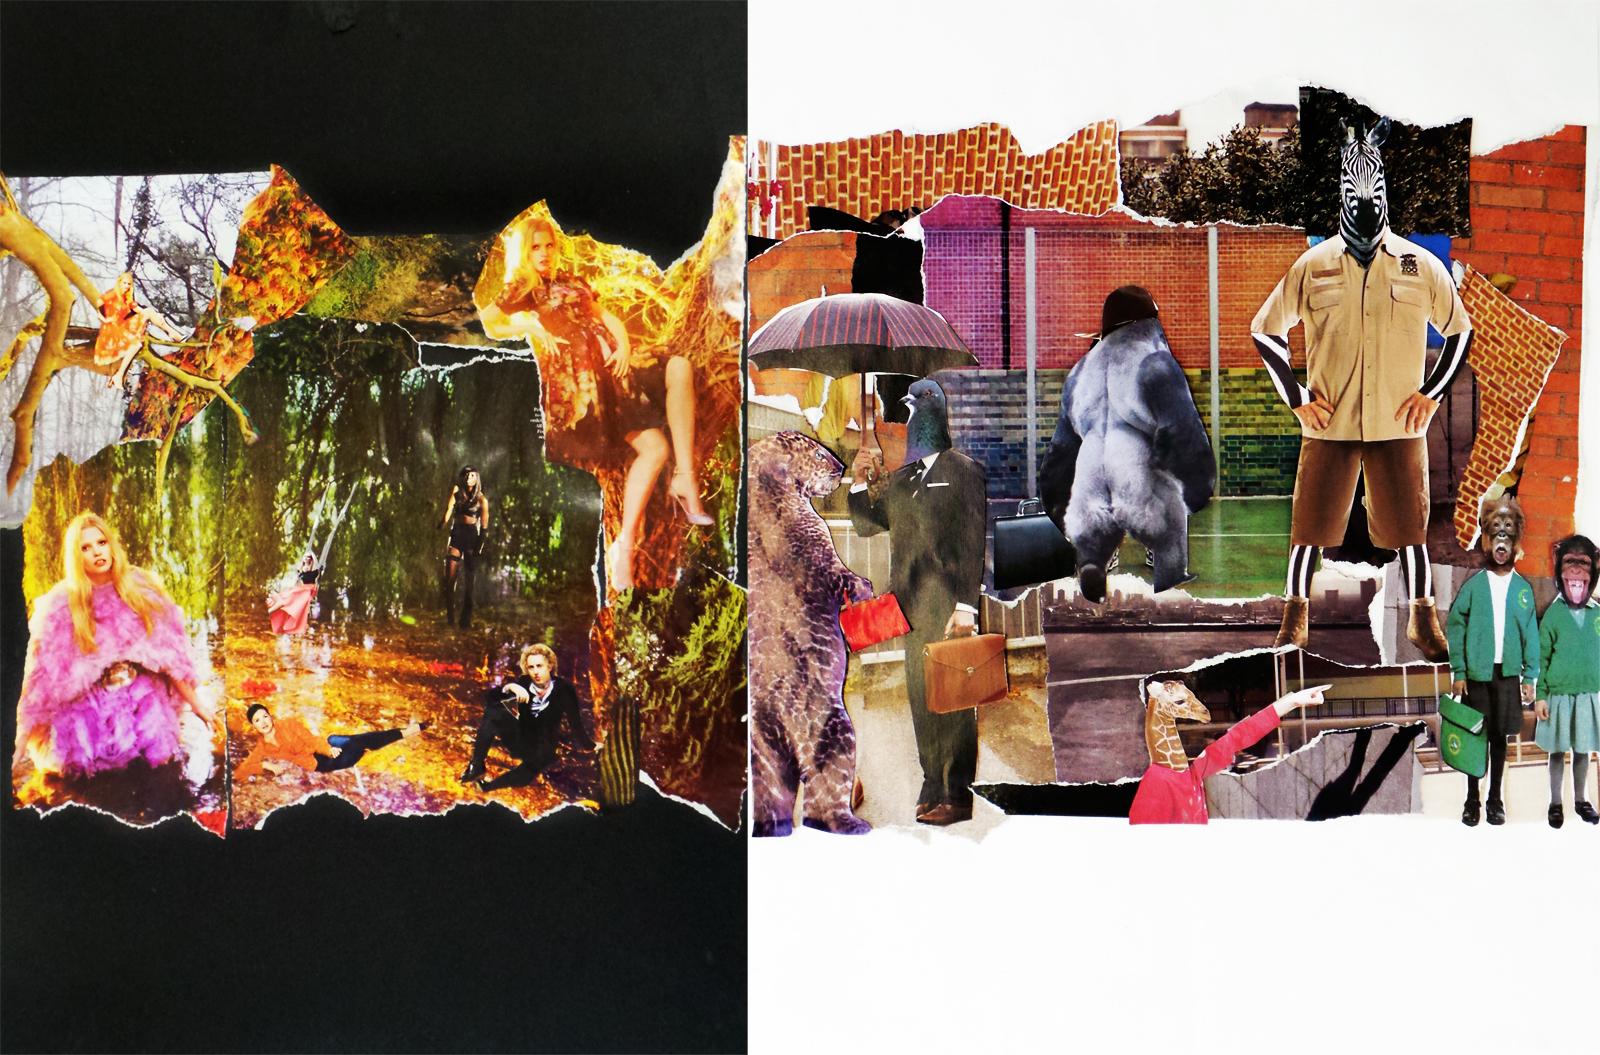 HumansVSAnimals Collages